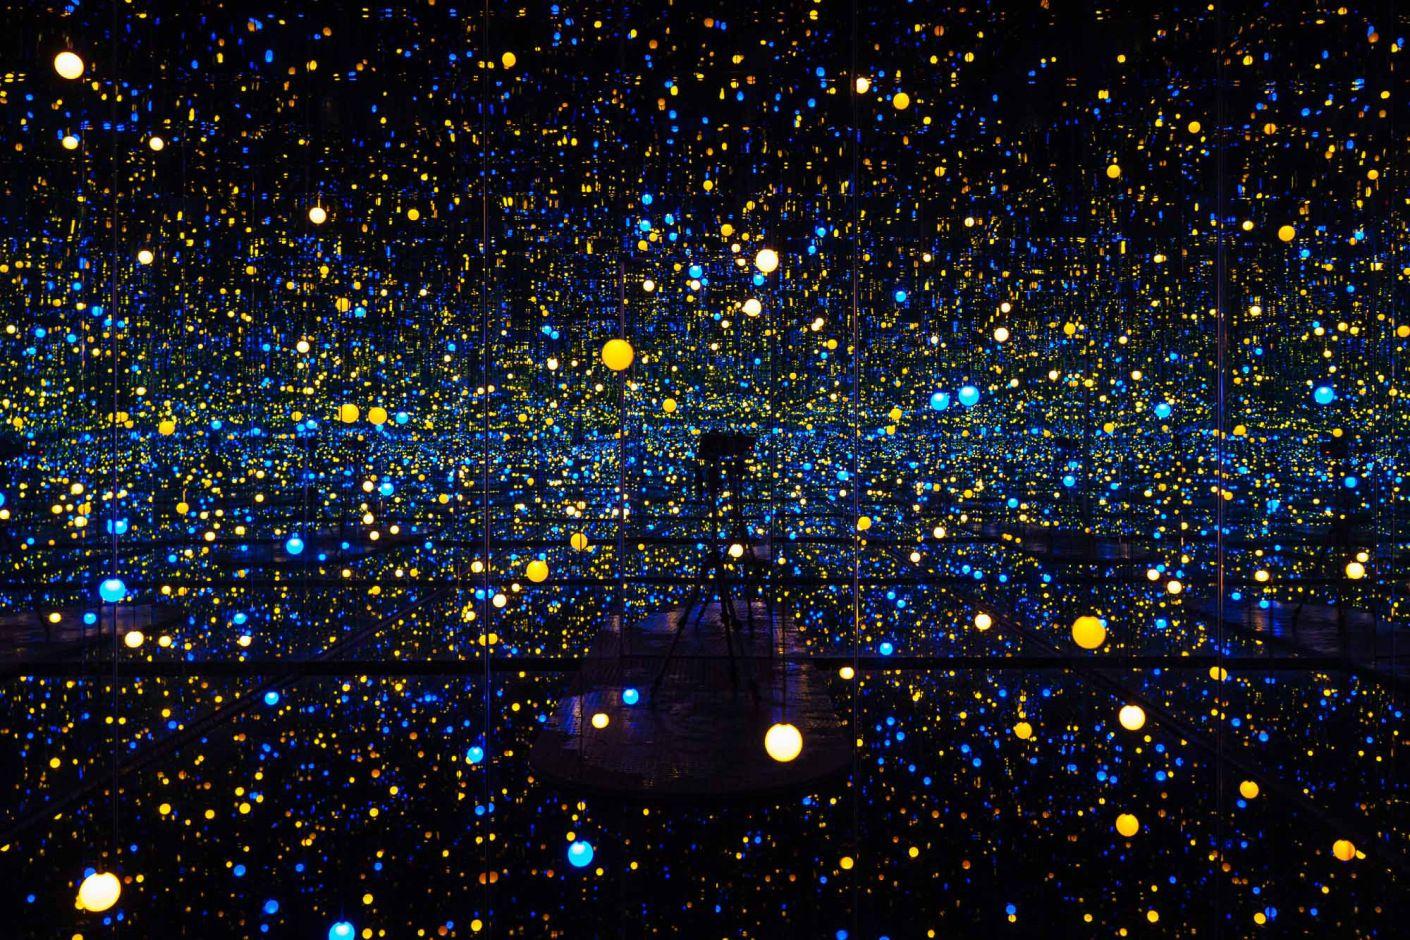 yayoi-kusamas-a-dream-i-dreamed-exhibition-moca-shanghai-21.jpg 1410 × 940 bildepunkter